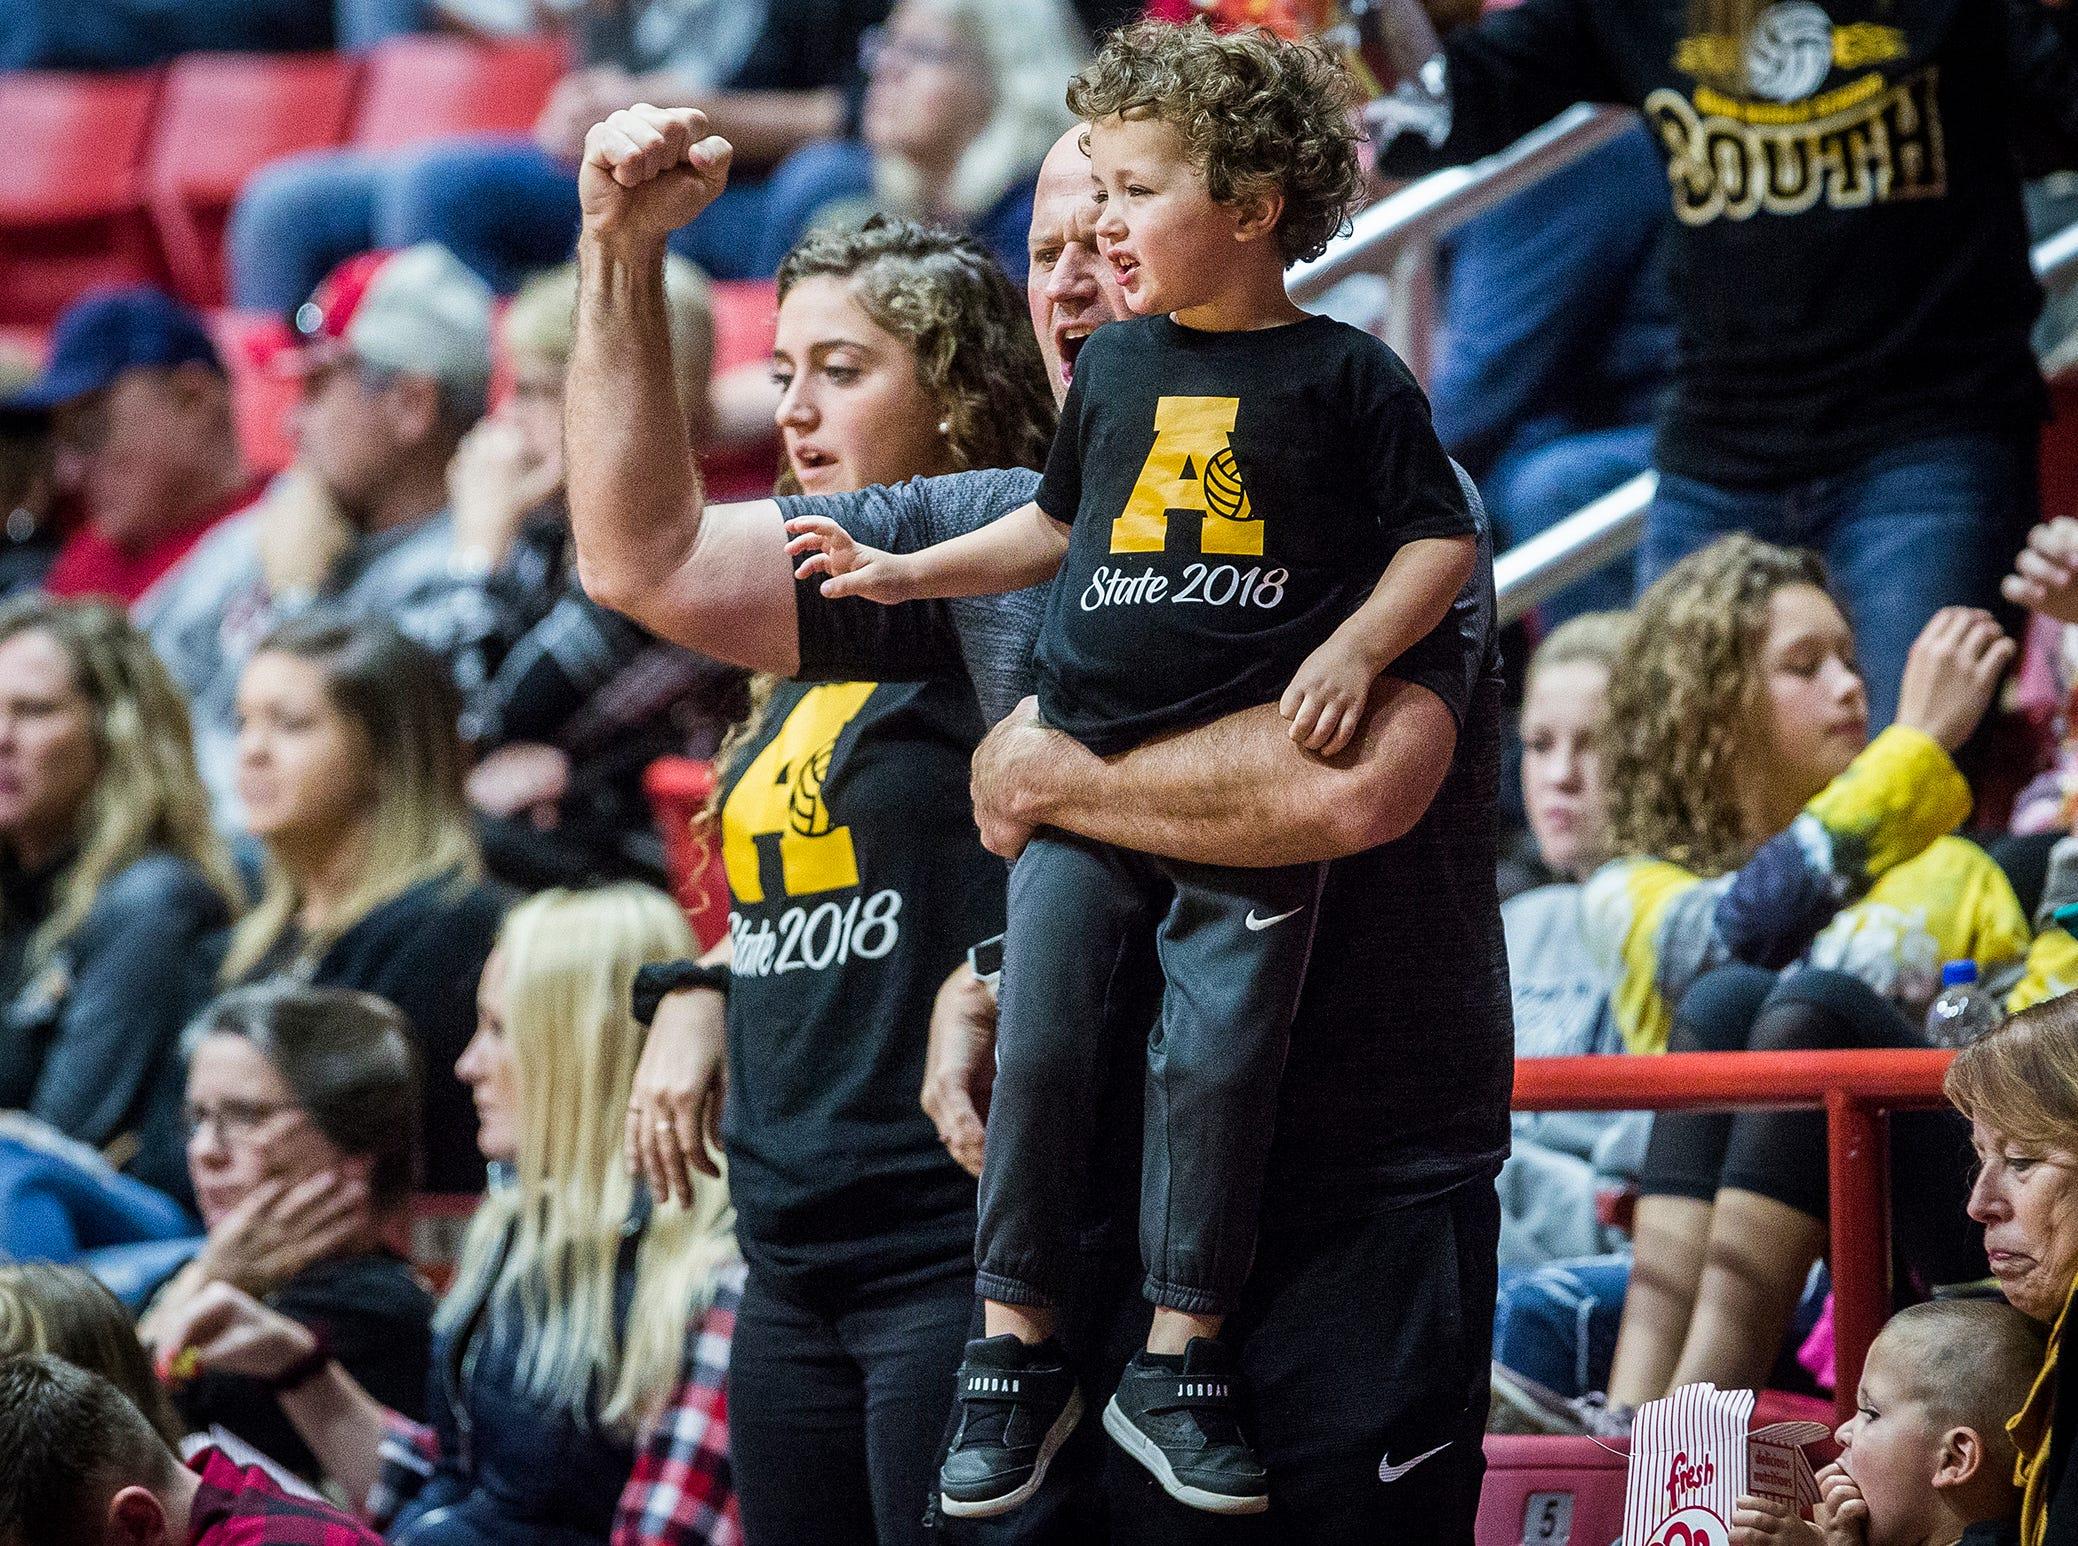 Yorktown defeated Avon 3-0 during their state final game at Worthen Arena Saturday, Nov. 3, 2018.